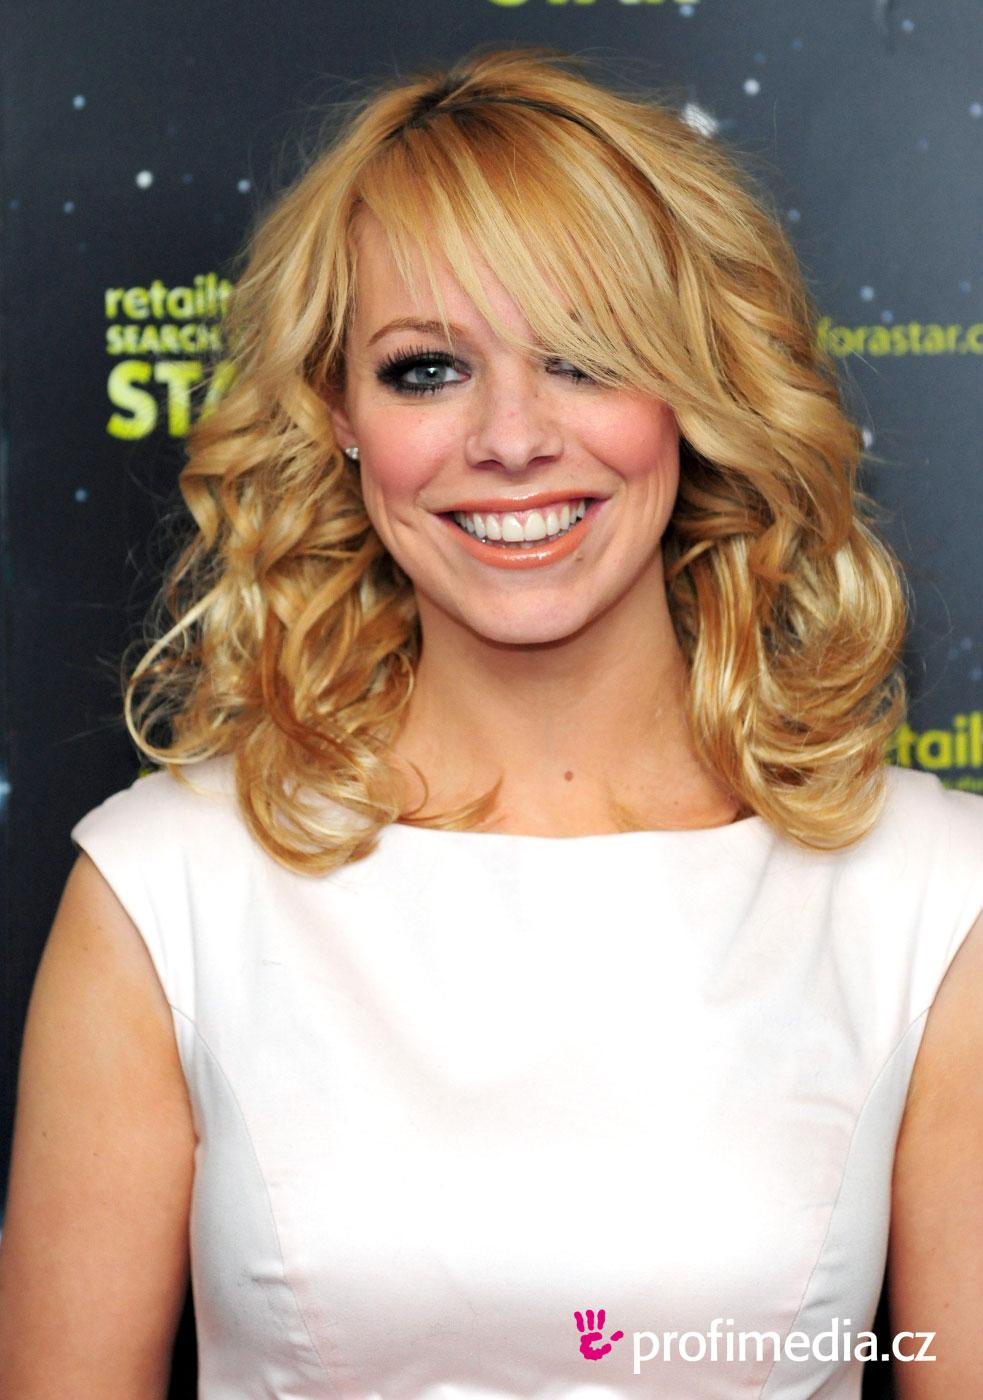 liz mcclarnon english pop singer dancer television presenter